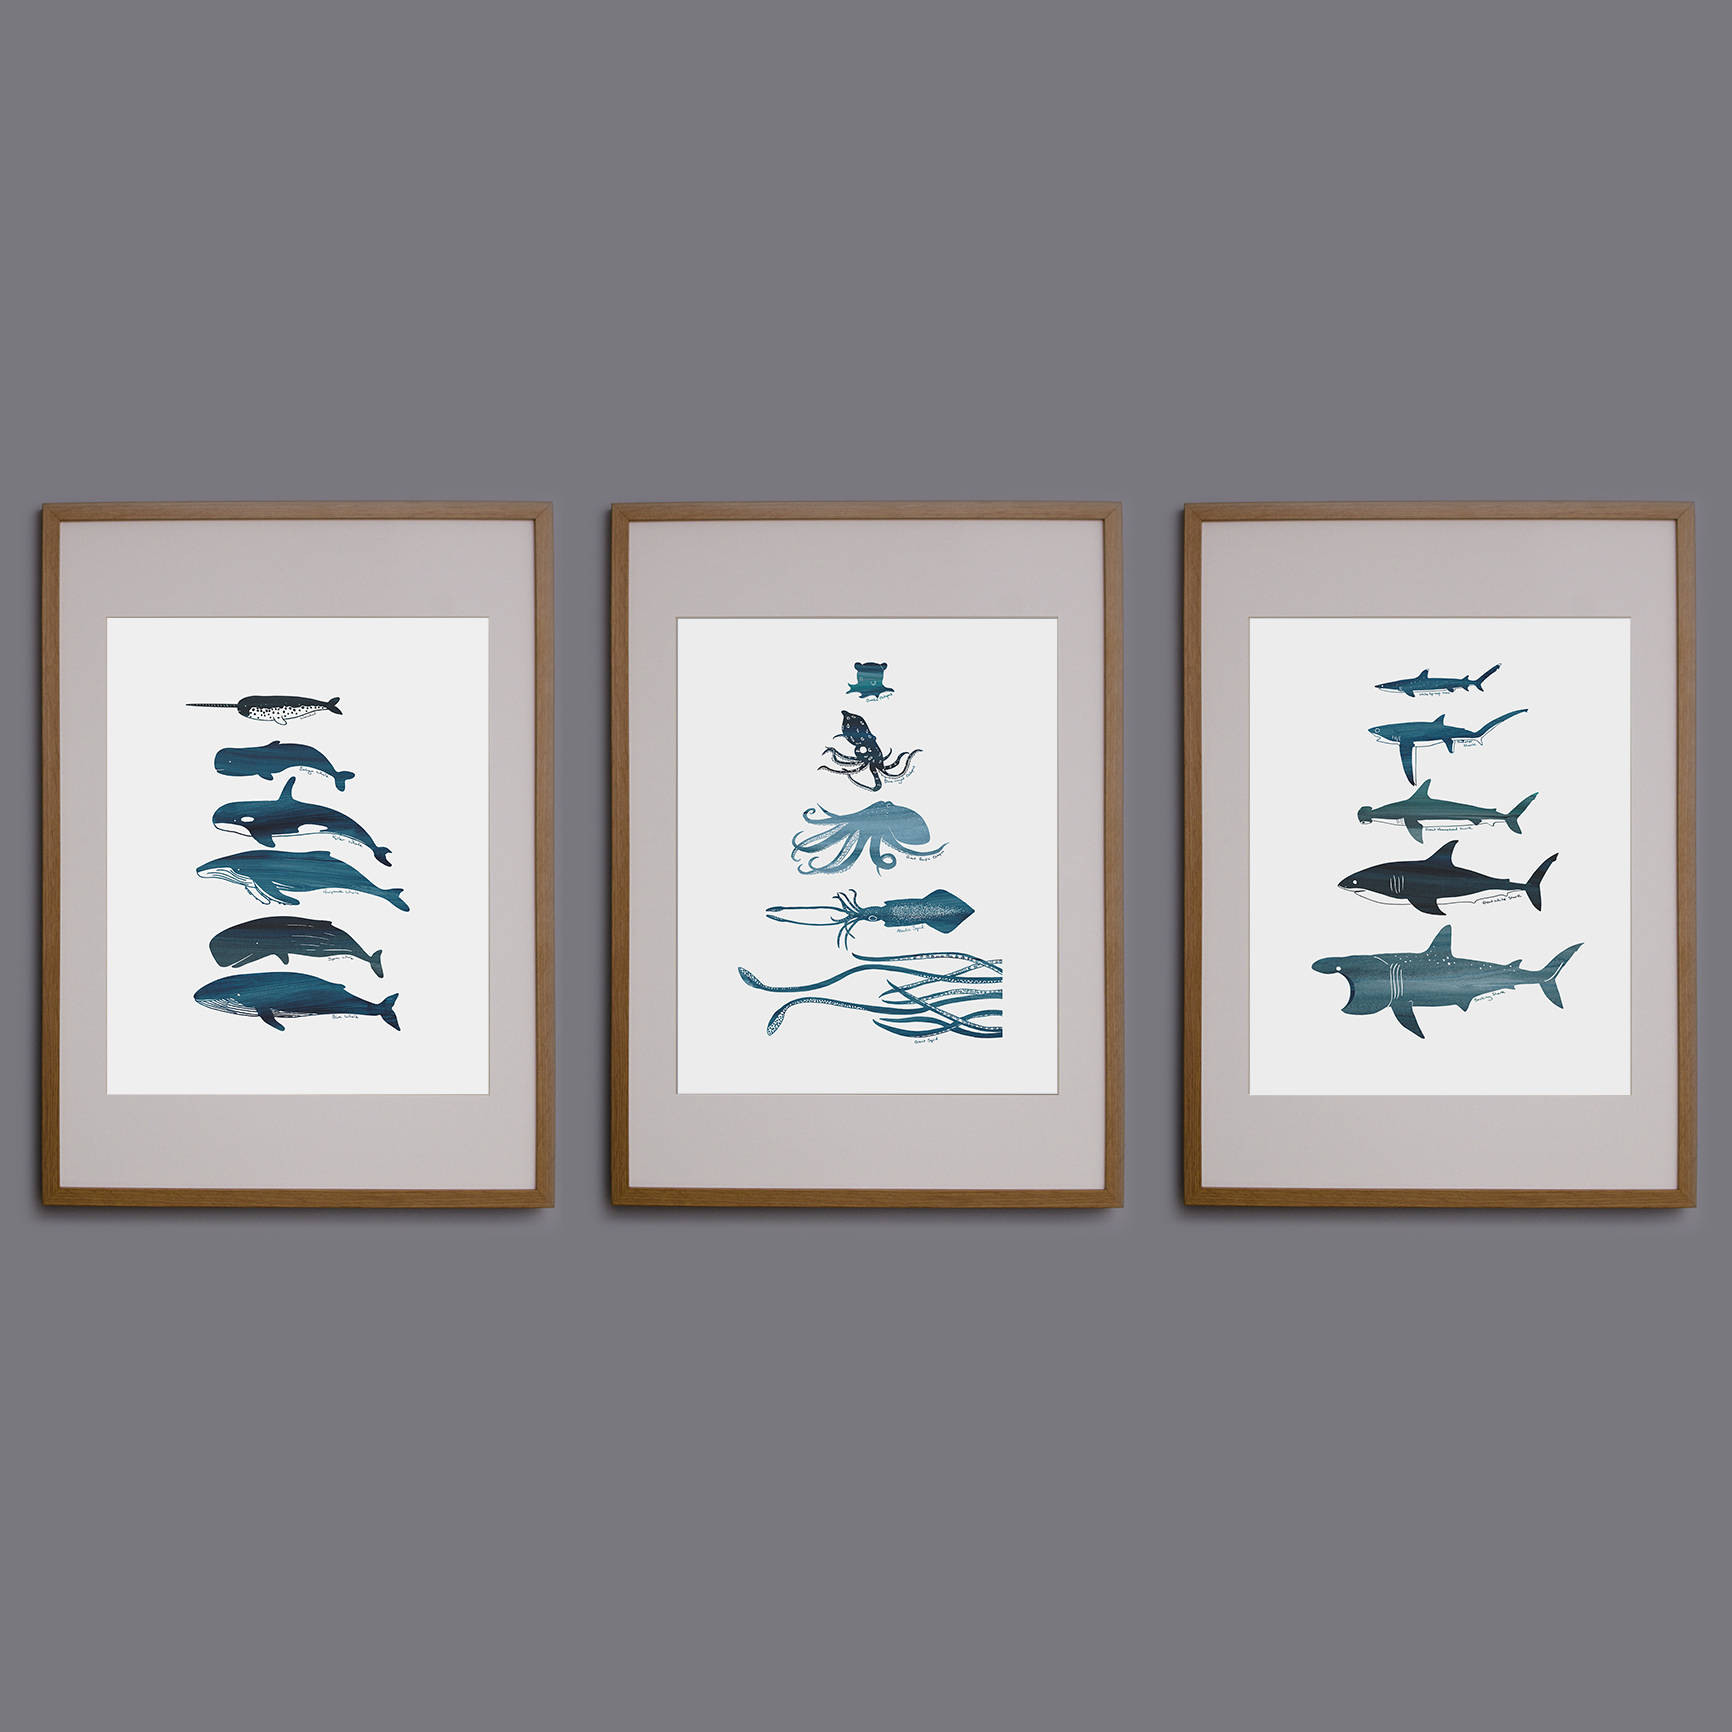 Ocean creatures prints. Whales, sharks or octopus/squid